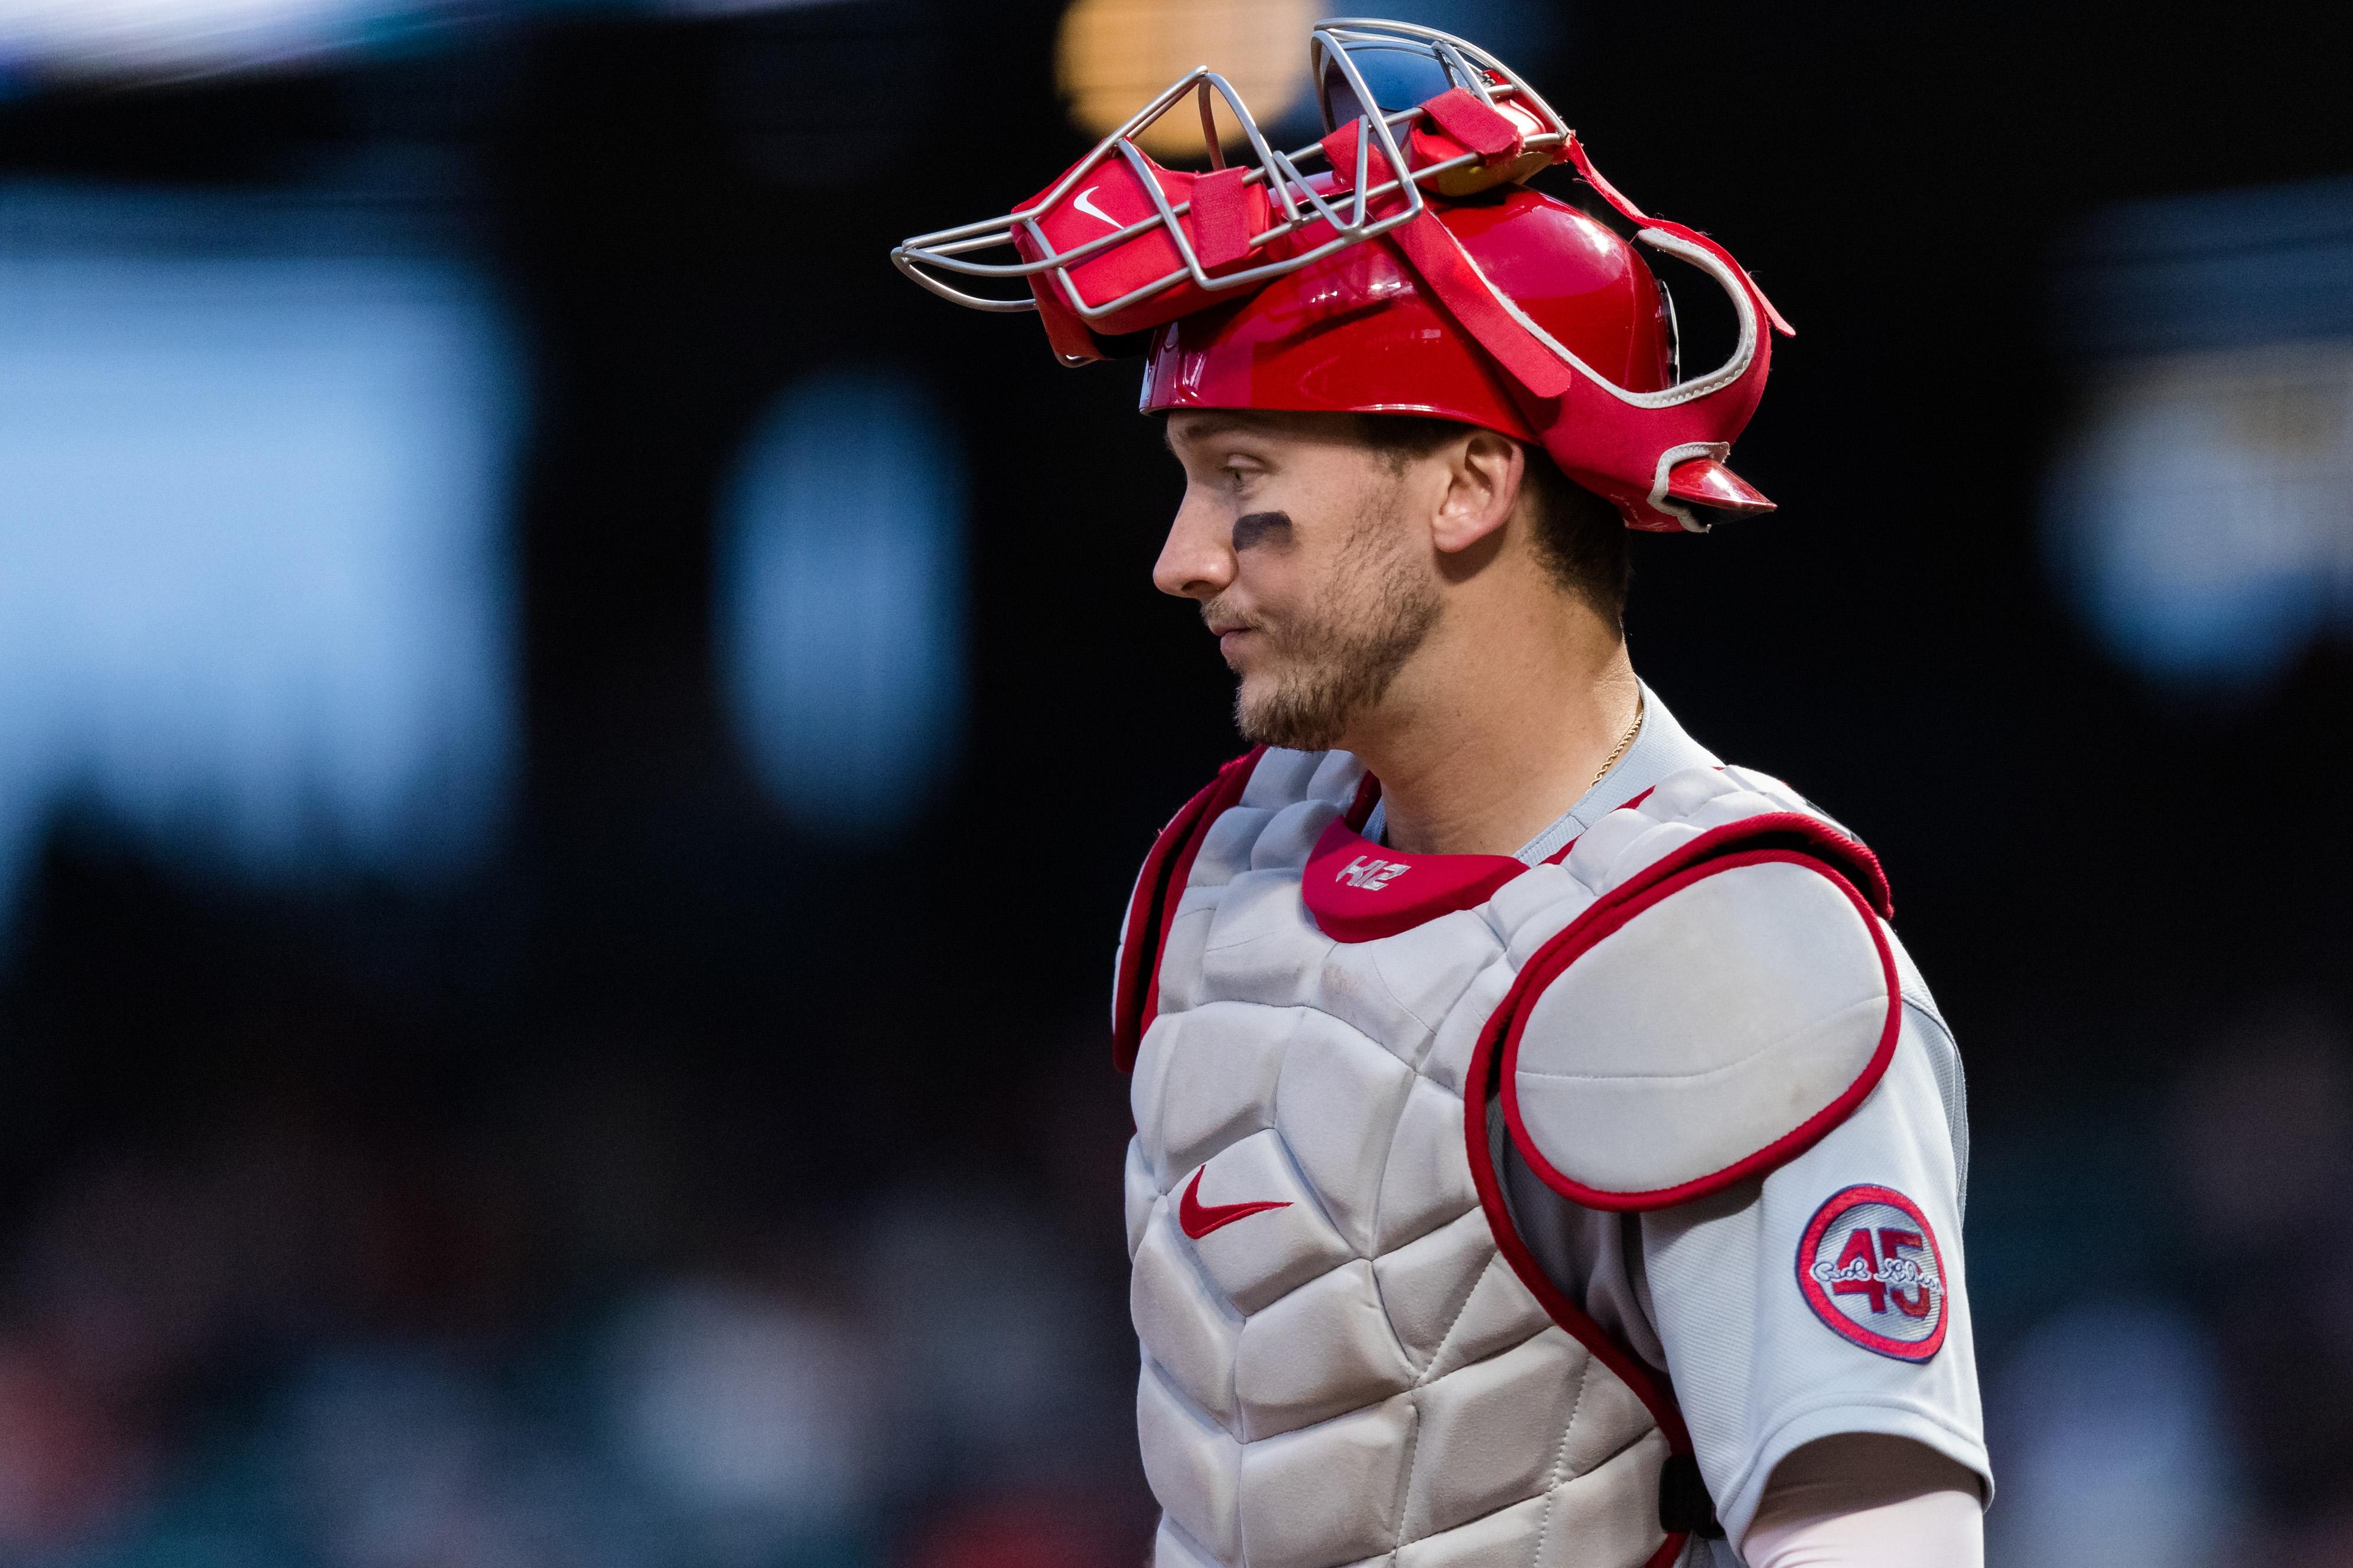 MLB:旧金山巨头圣路易斯红雀队